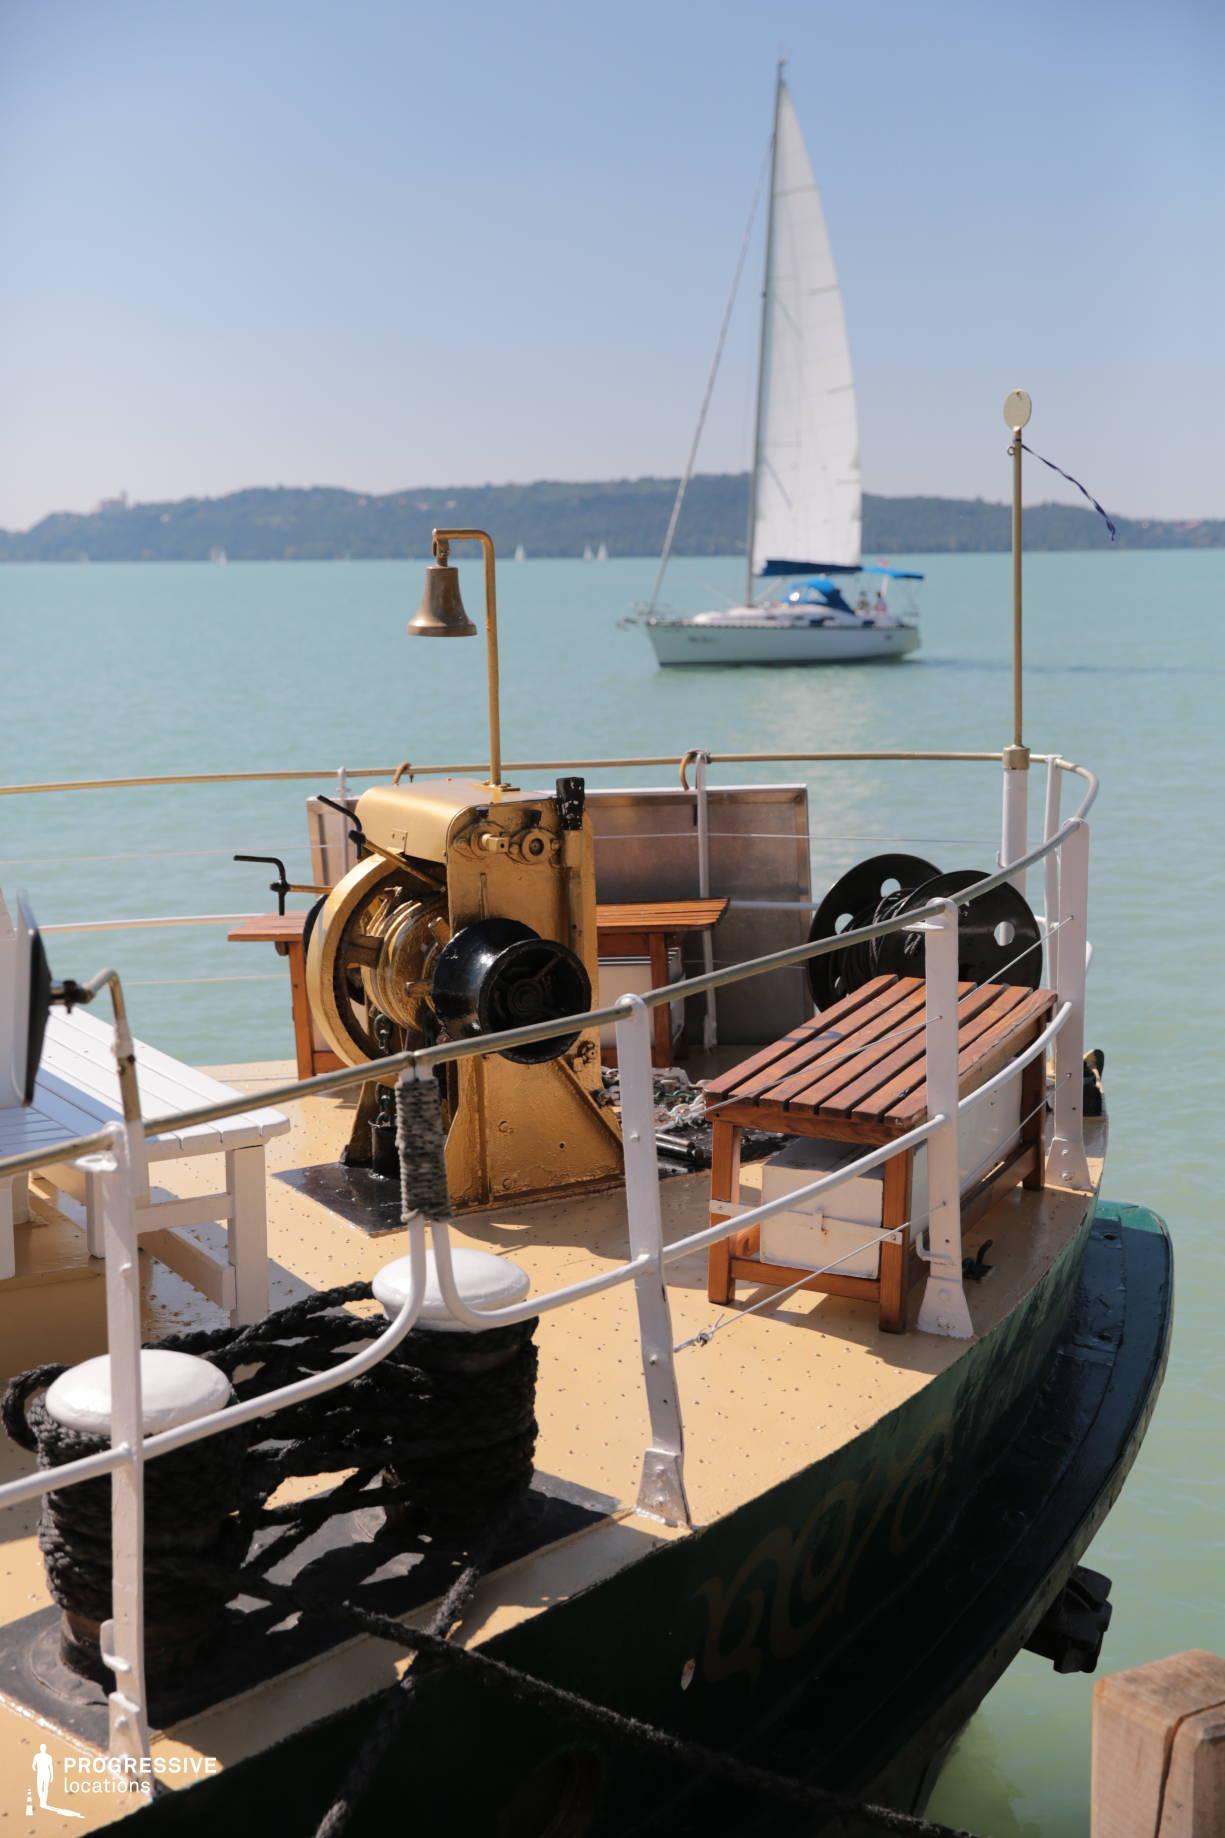 Locations in Hungary: Old Ship, Balaton